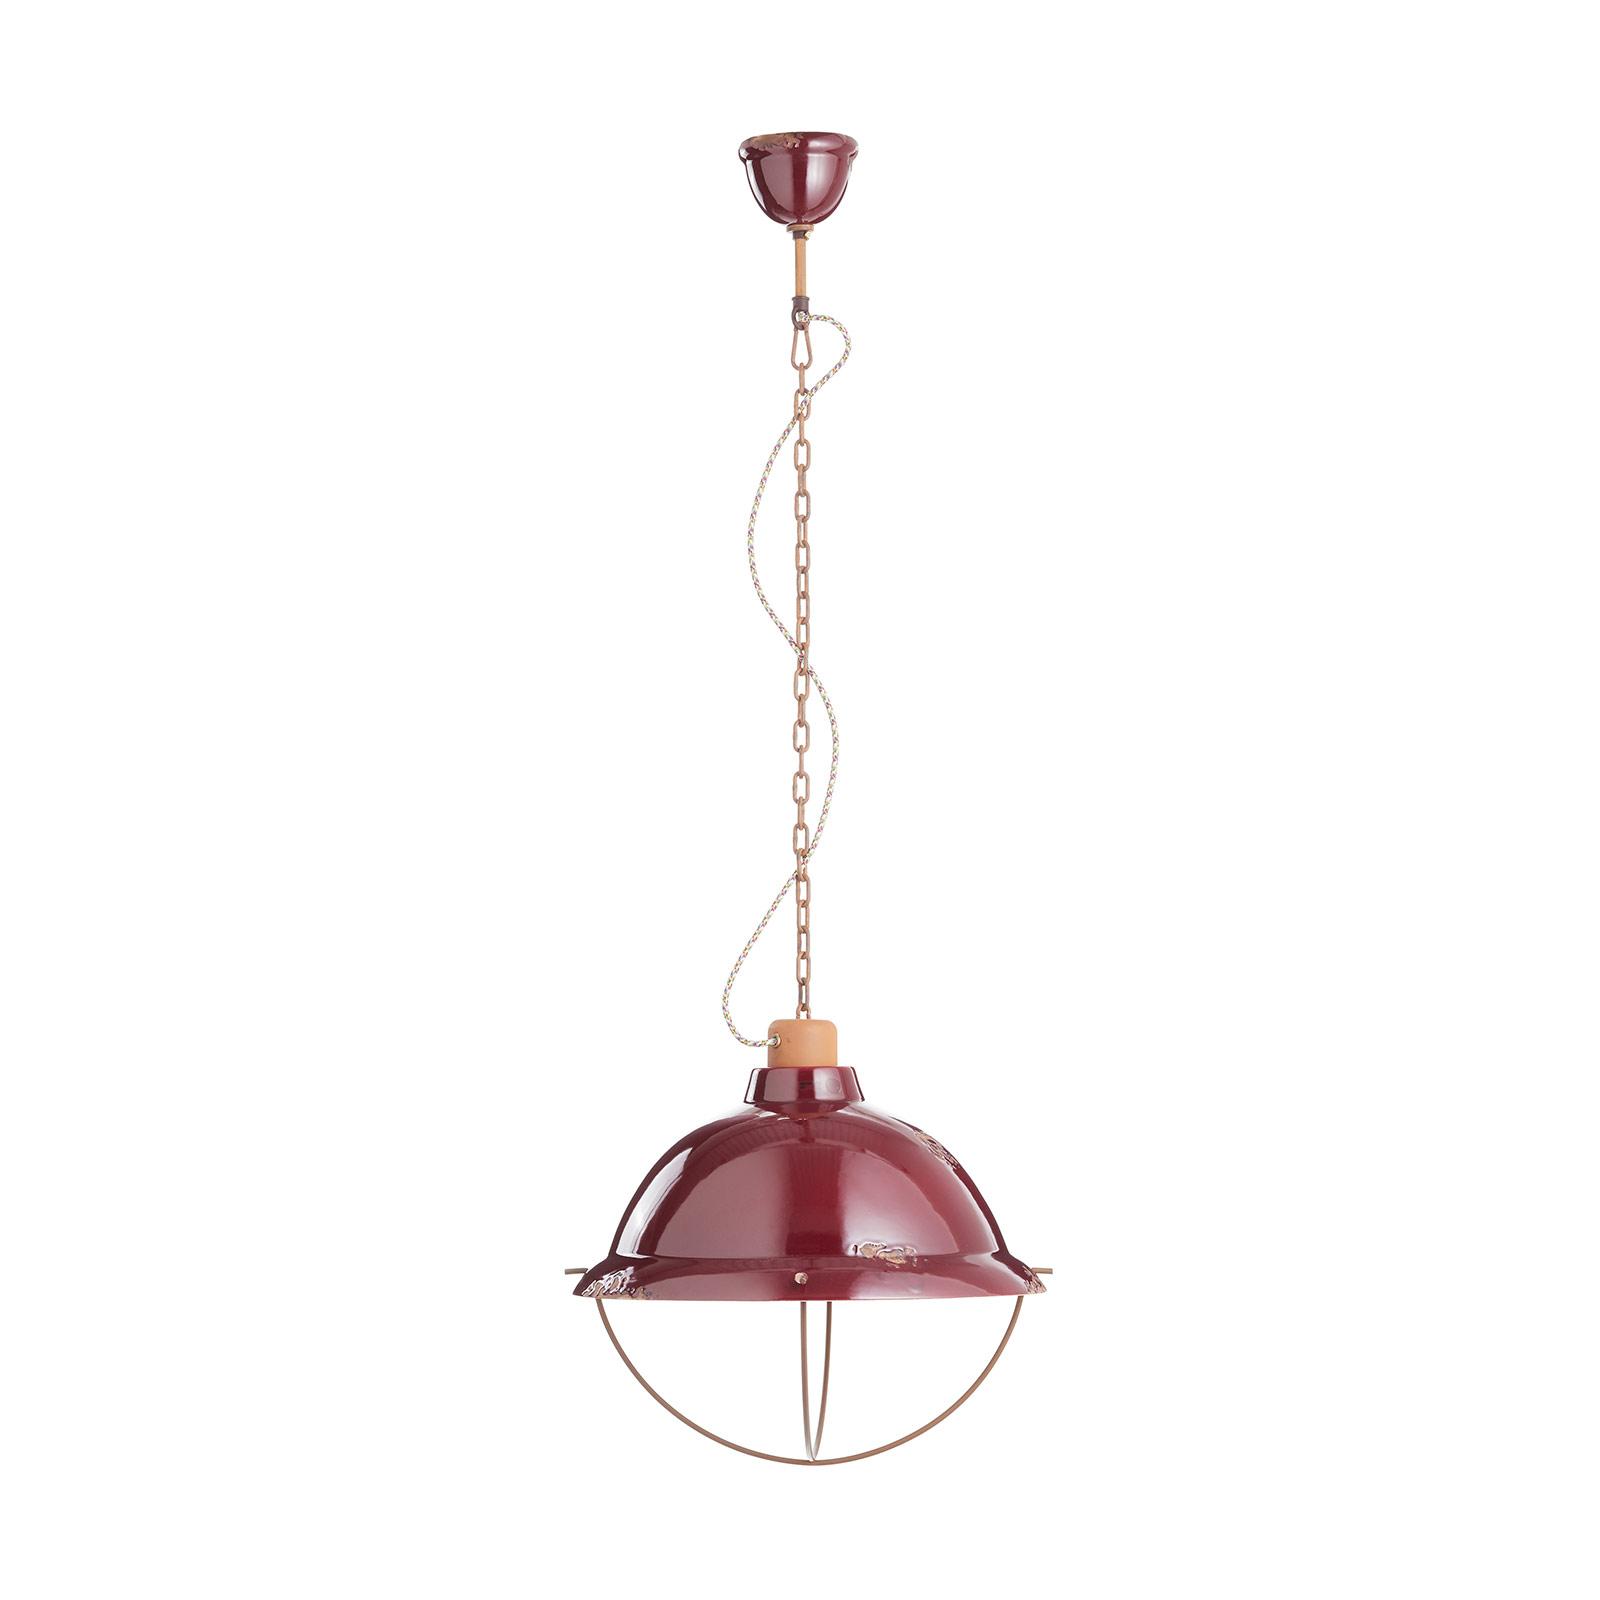 Hanglamp C1680 van keramiek, bordeaux